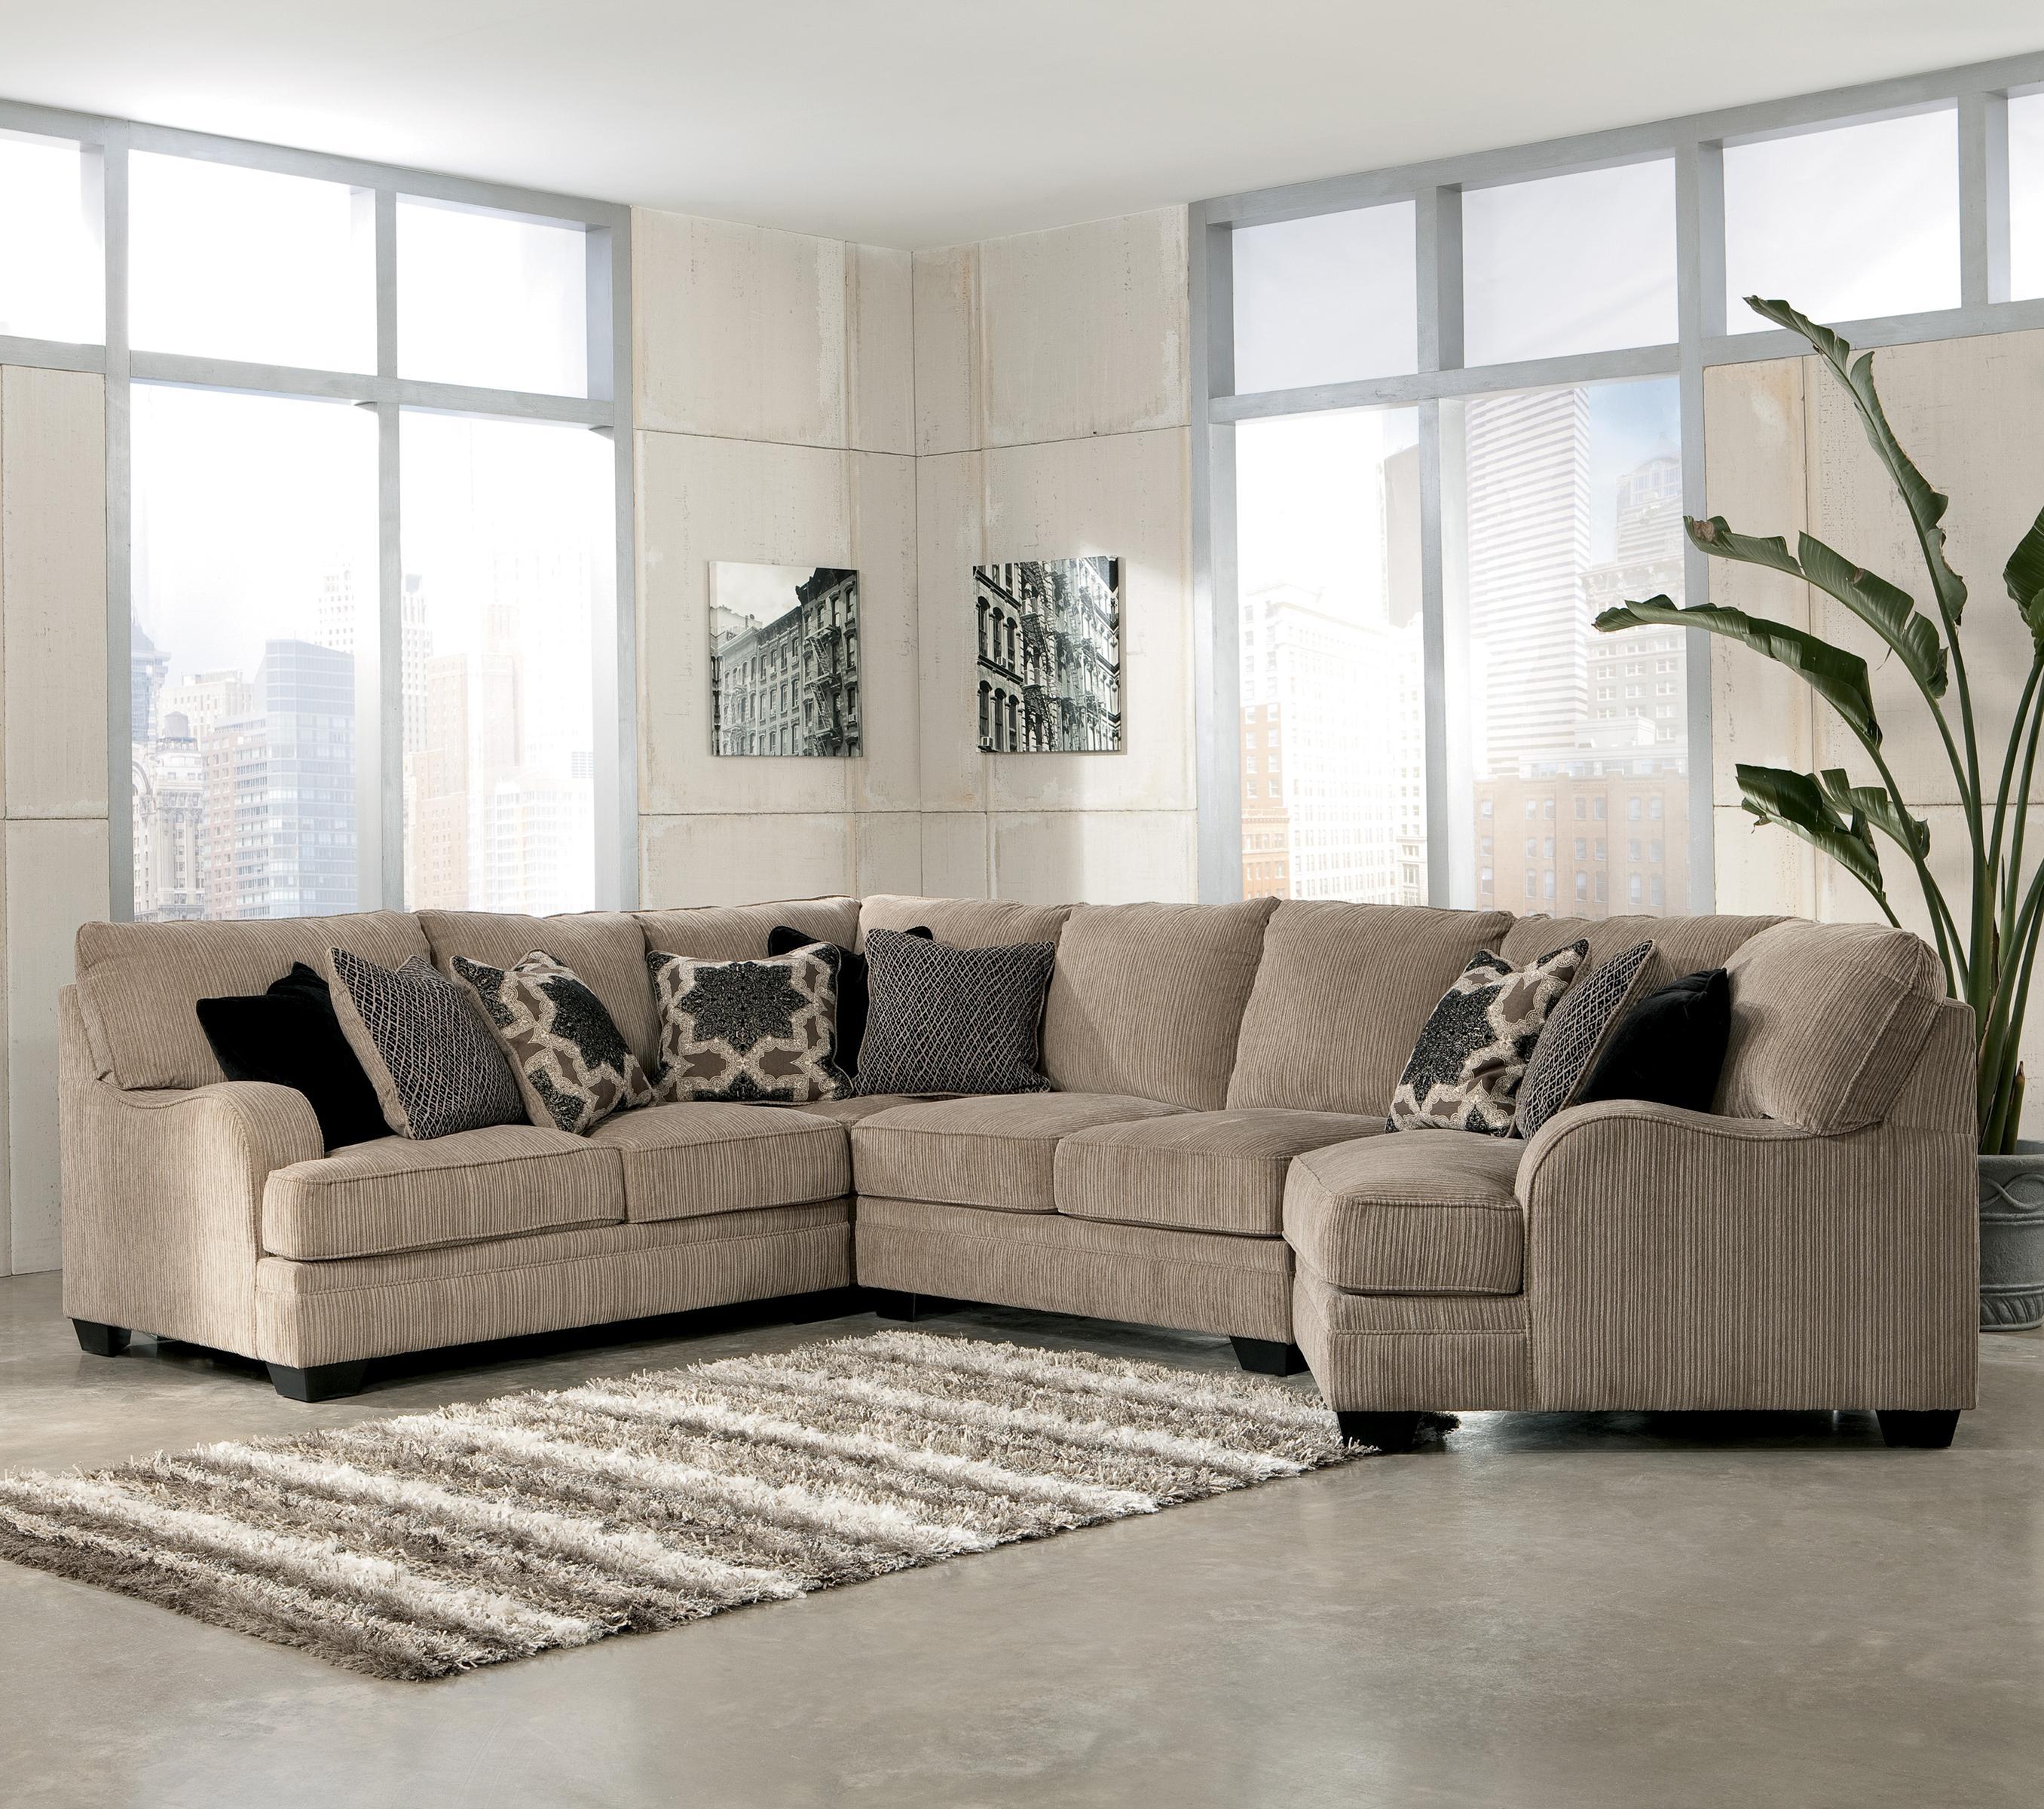 Signature Designashley Katisha - Platinum 4-Piece Sectional Sofa with Peterborough Ontario Sectional Sofas (Image 9 of 10)